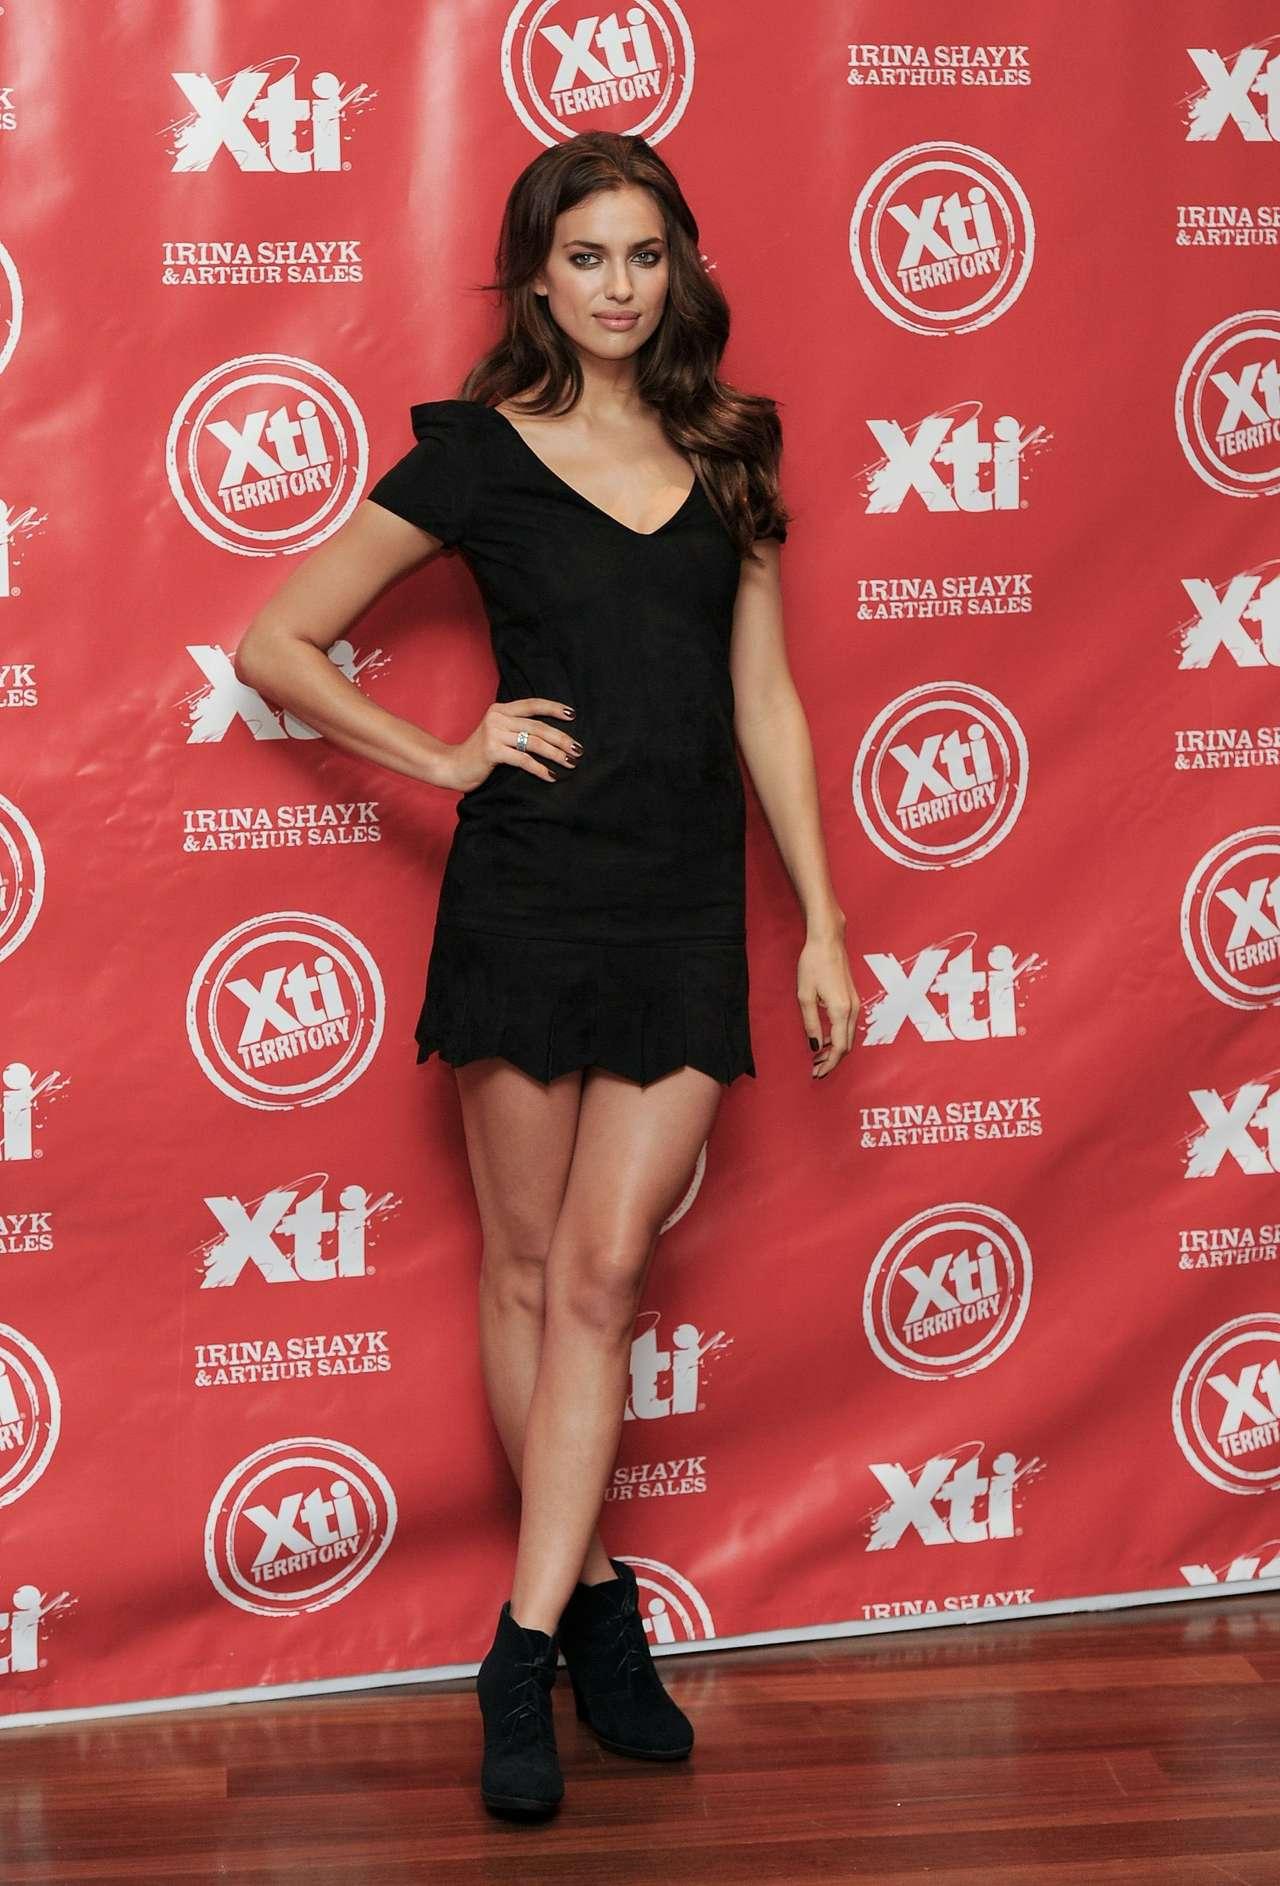 Irina Shayk Xti Footwear Irina Shayk Xti Shoes 07